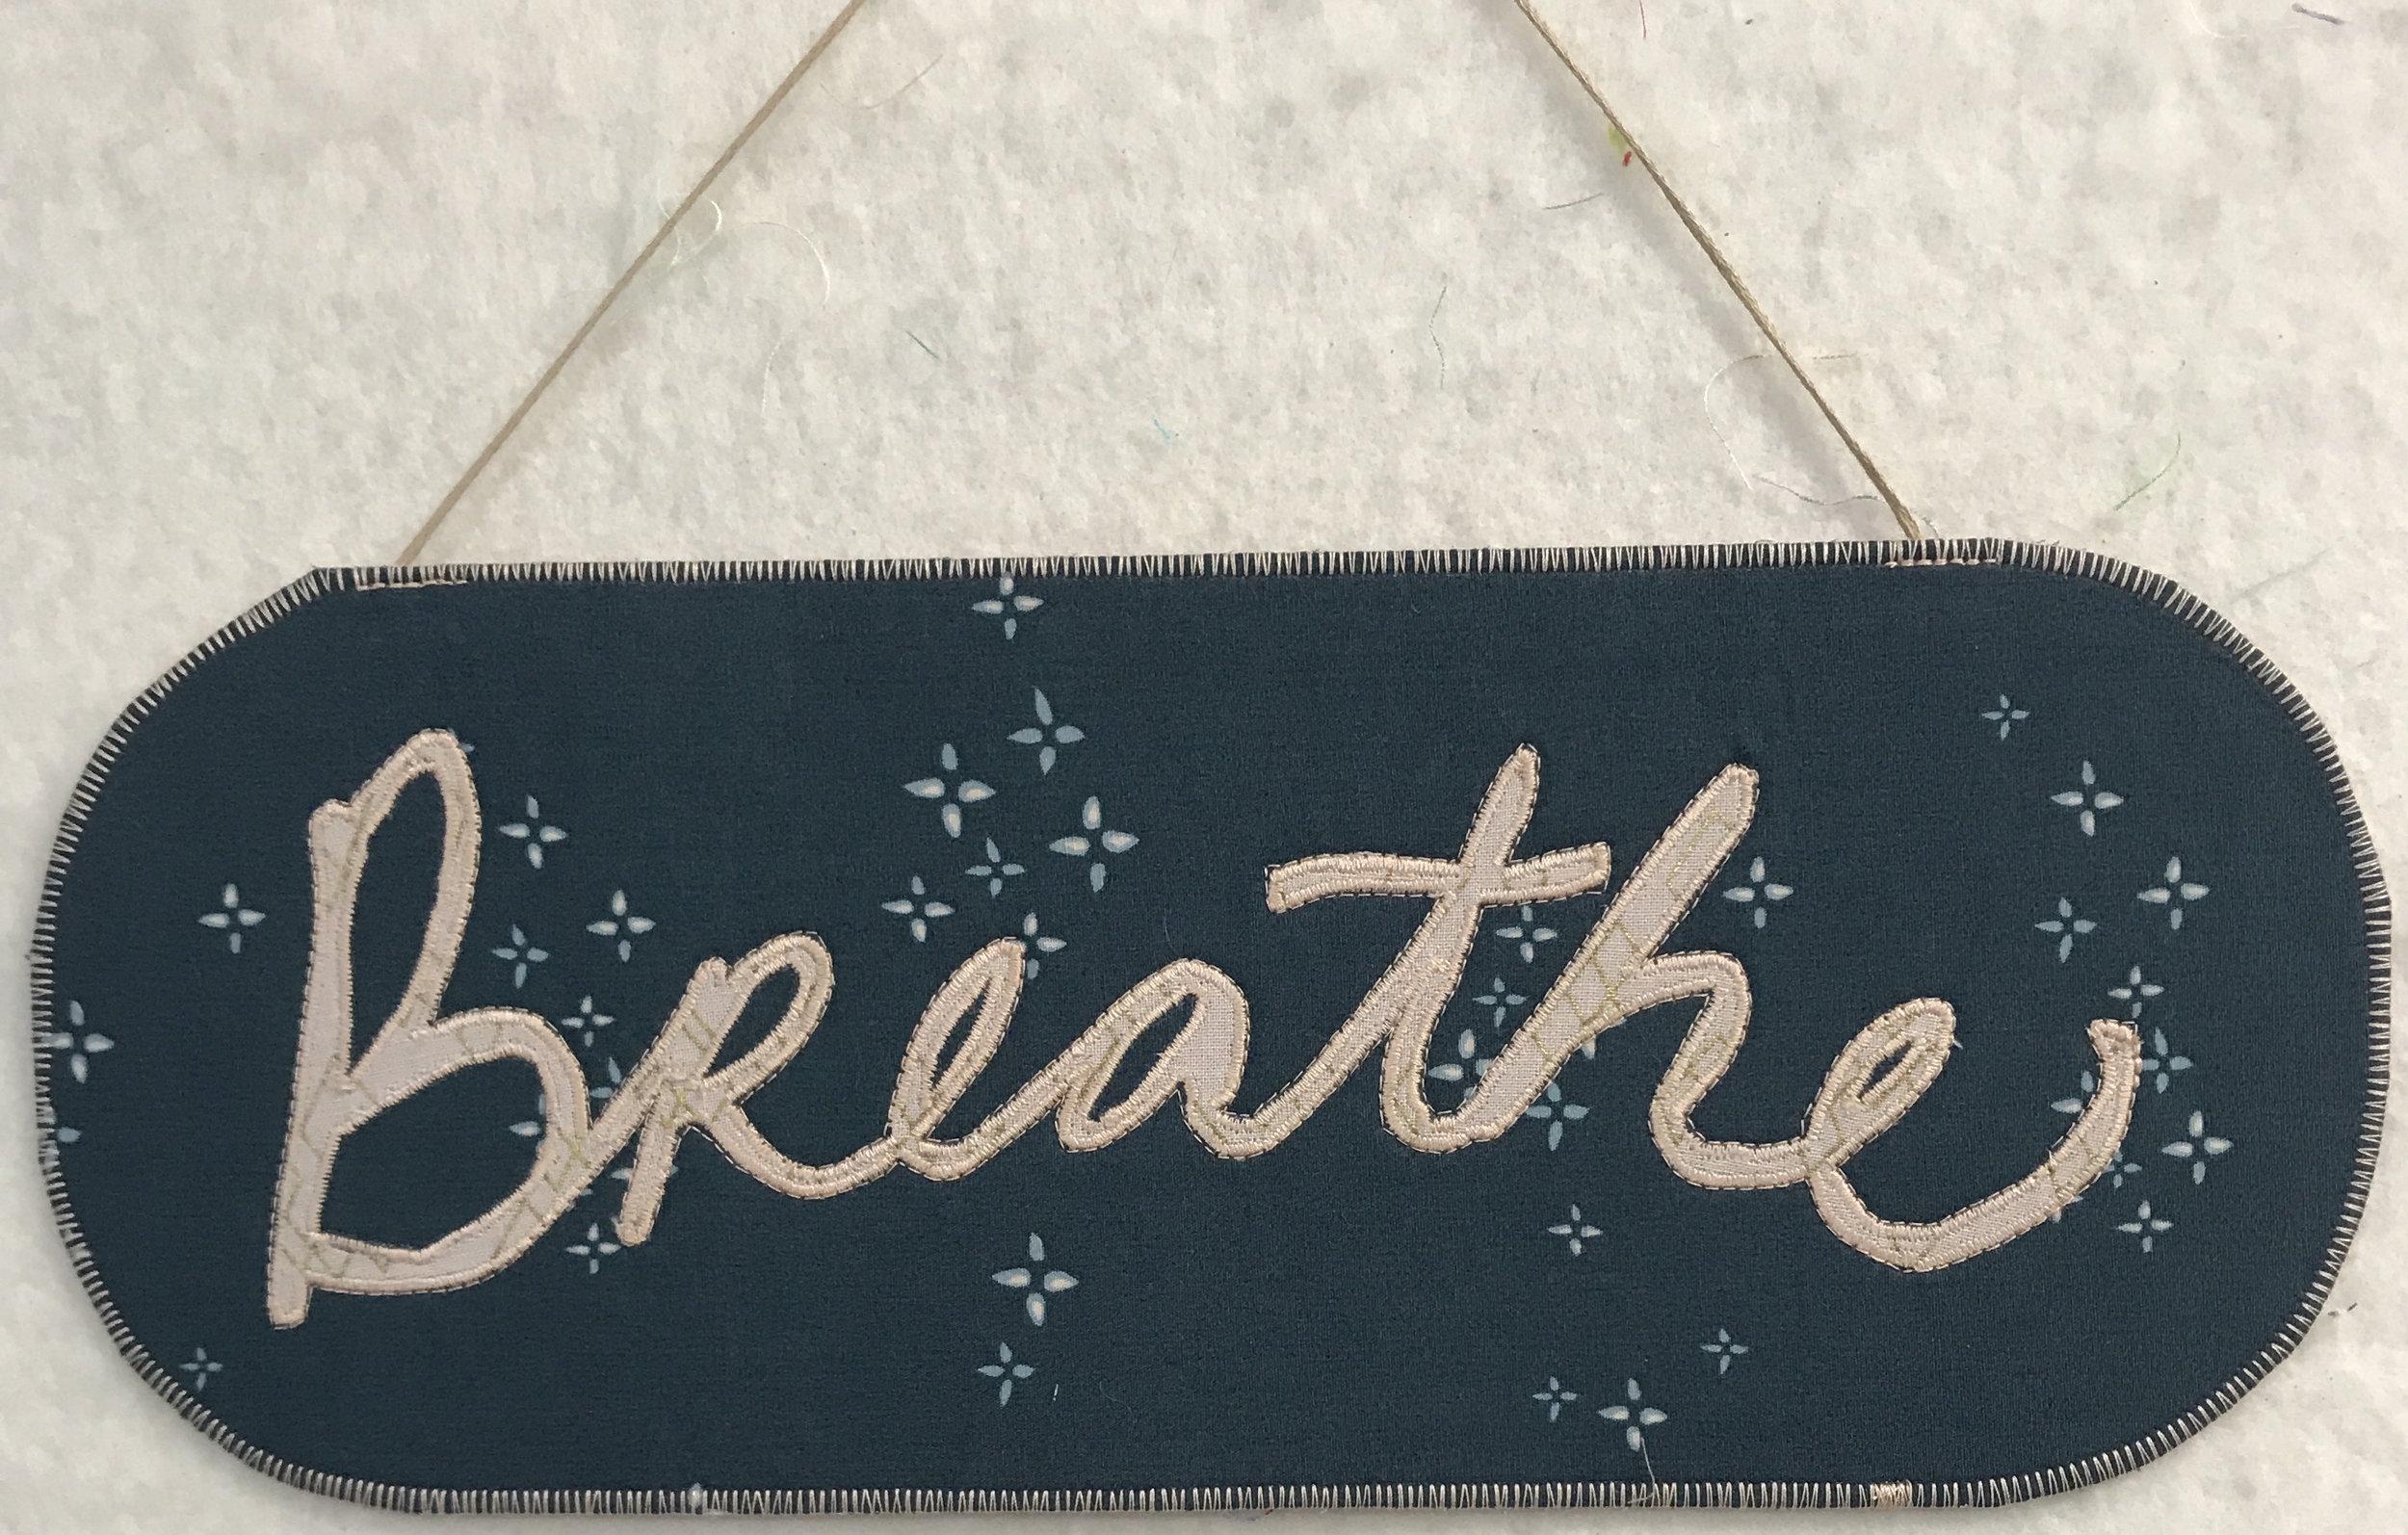 breathe sign.jpg